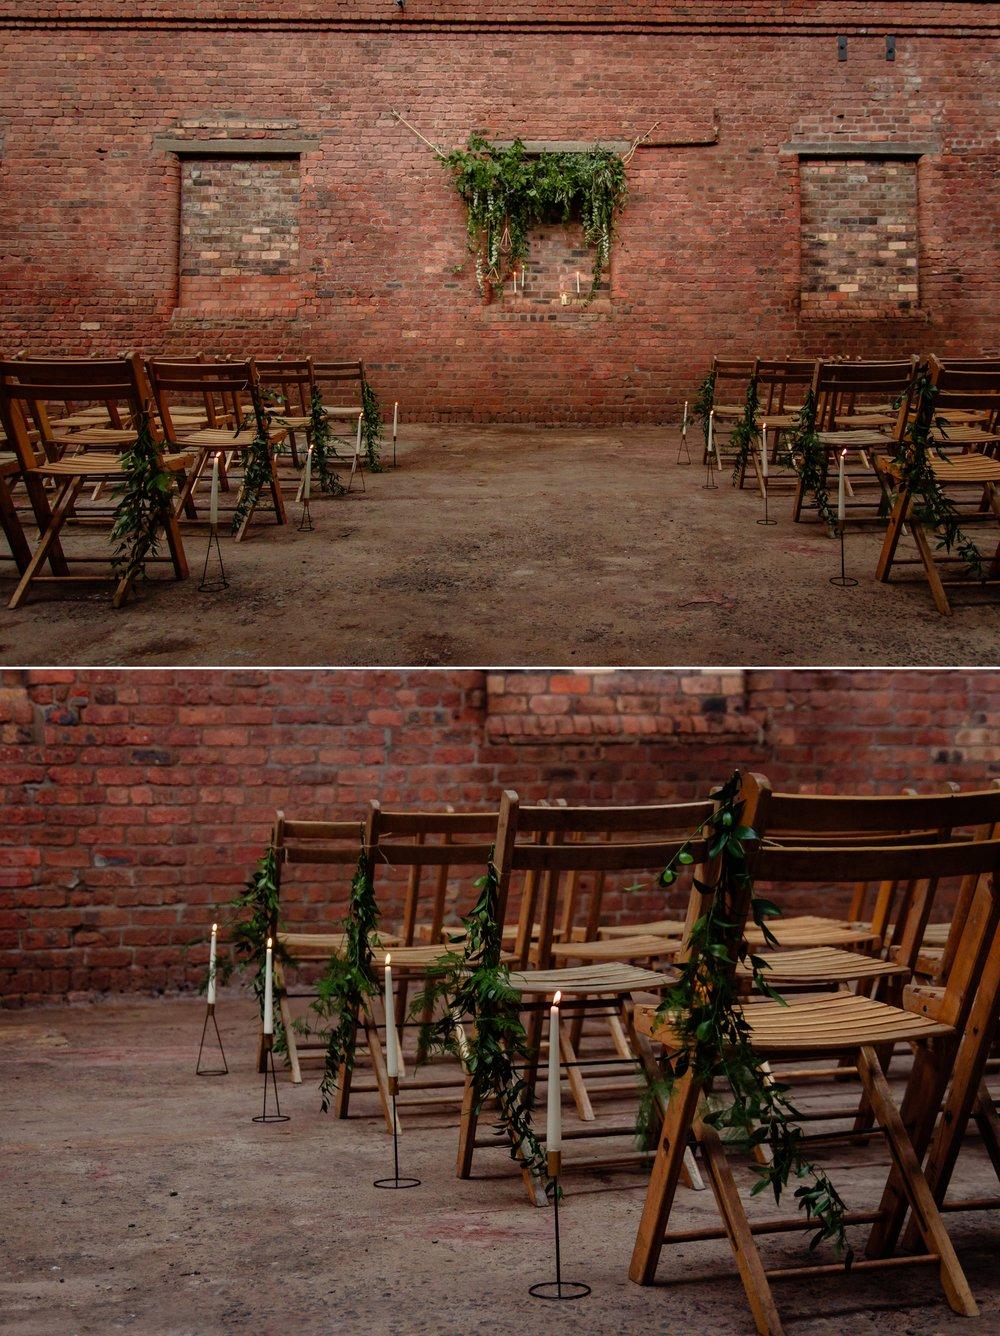 engine-works-wedding-styled-shoot-fotomaki-photography-53.jpg